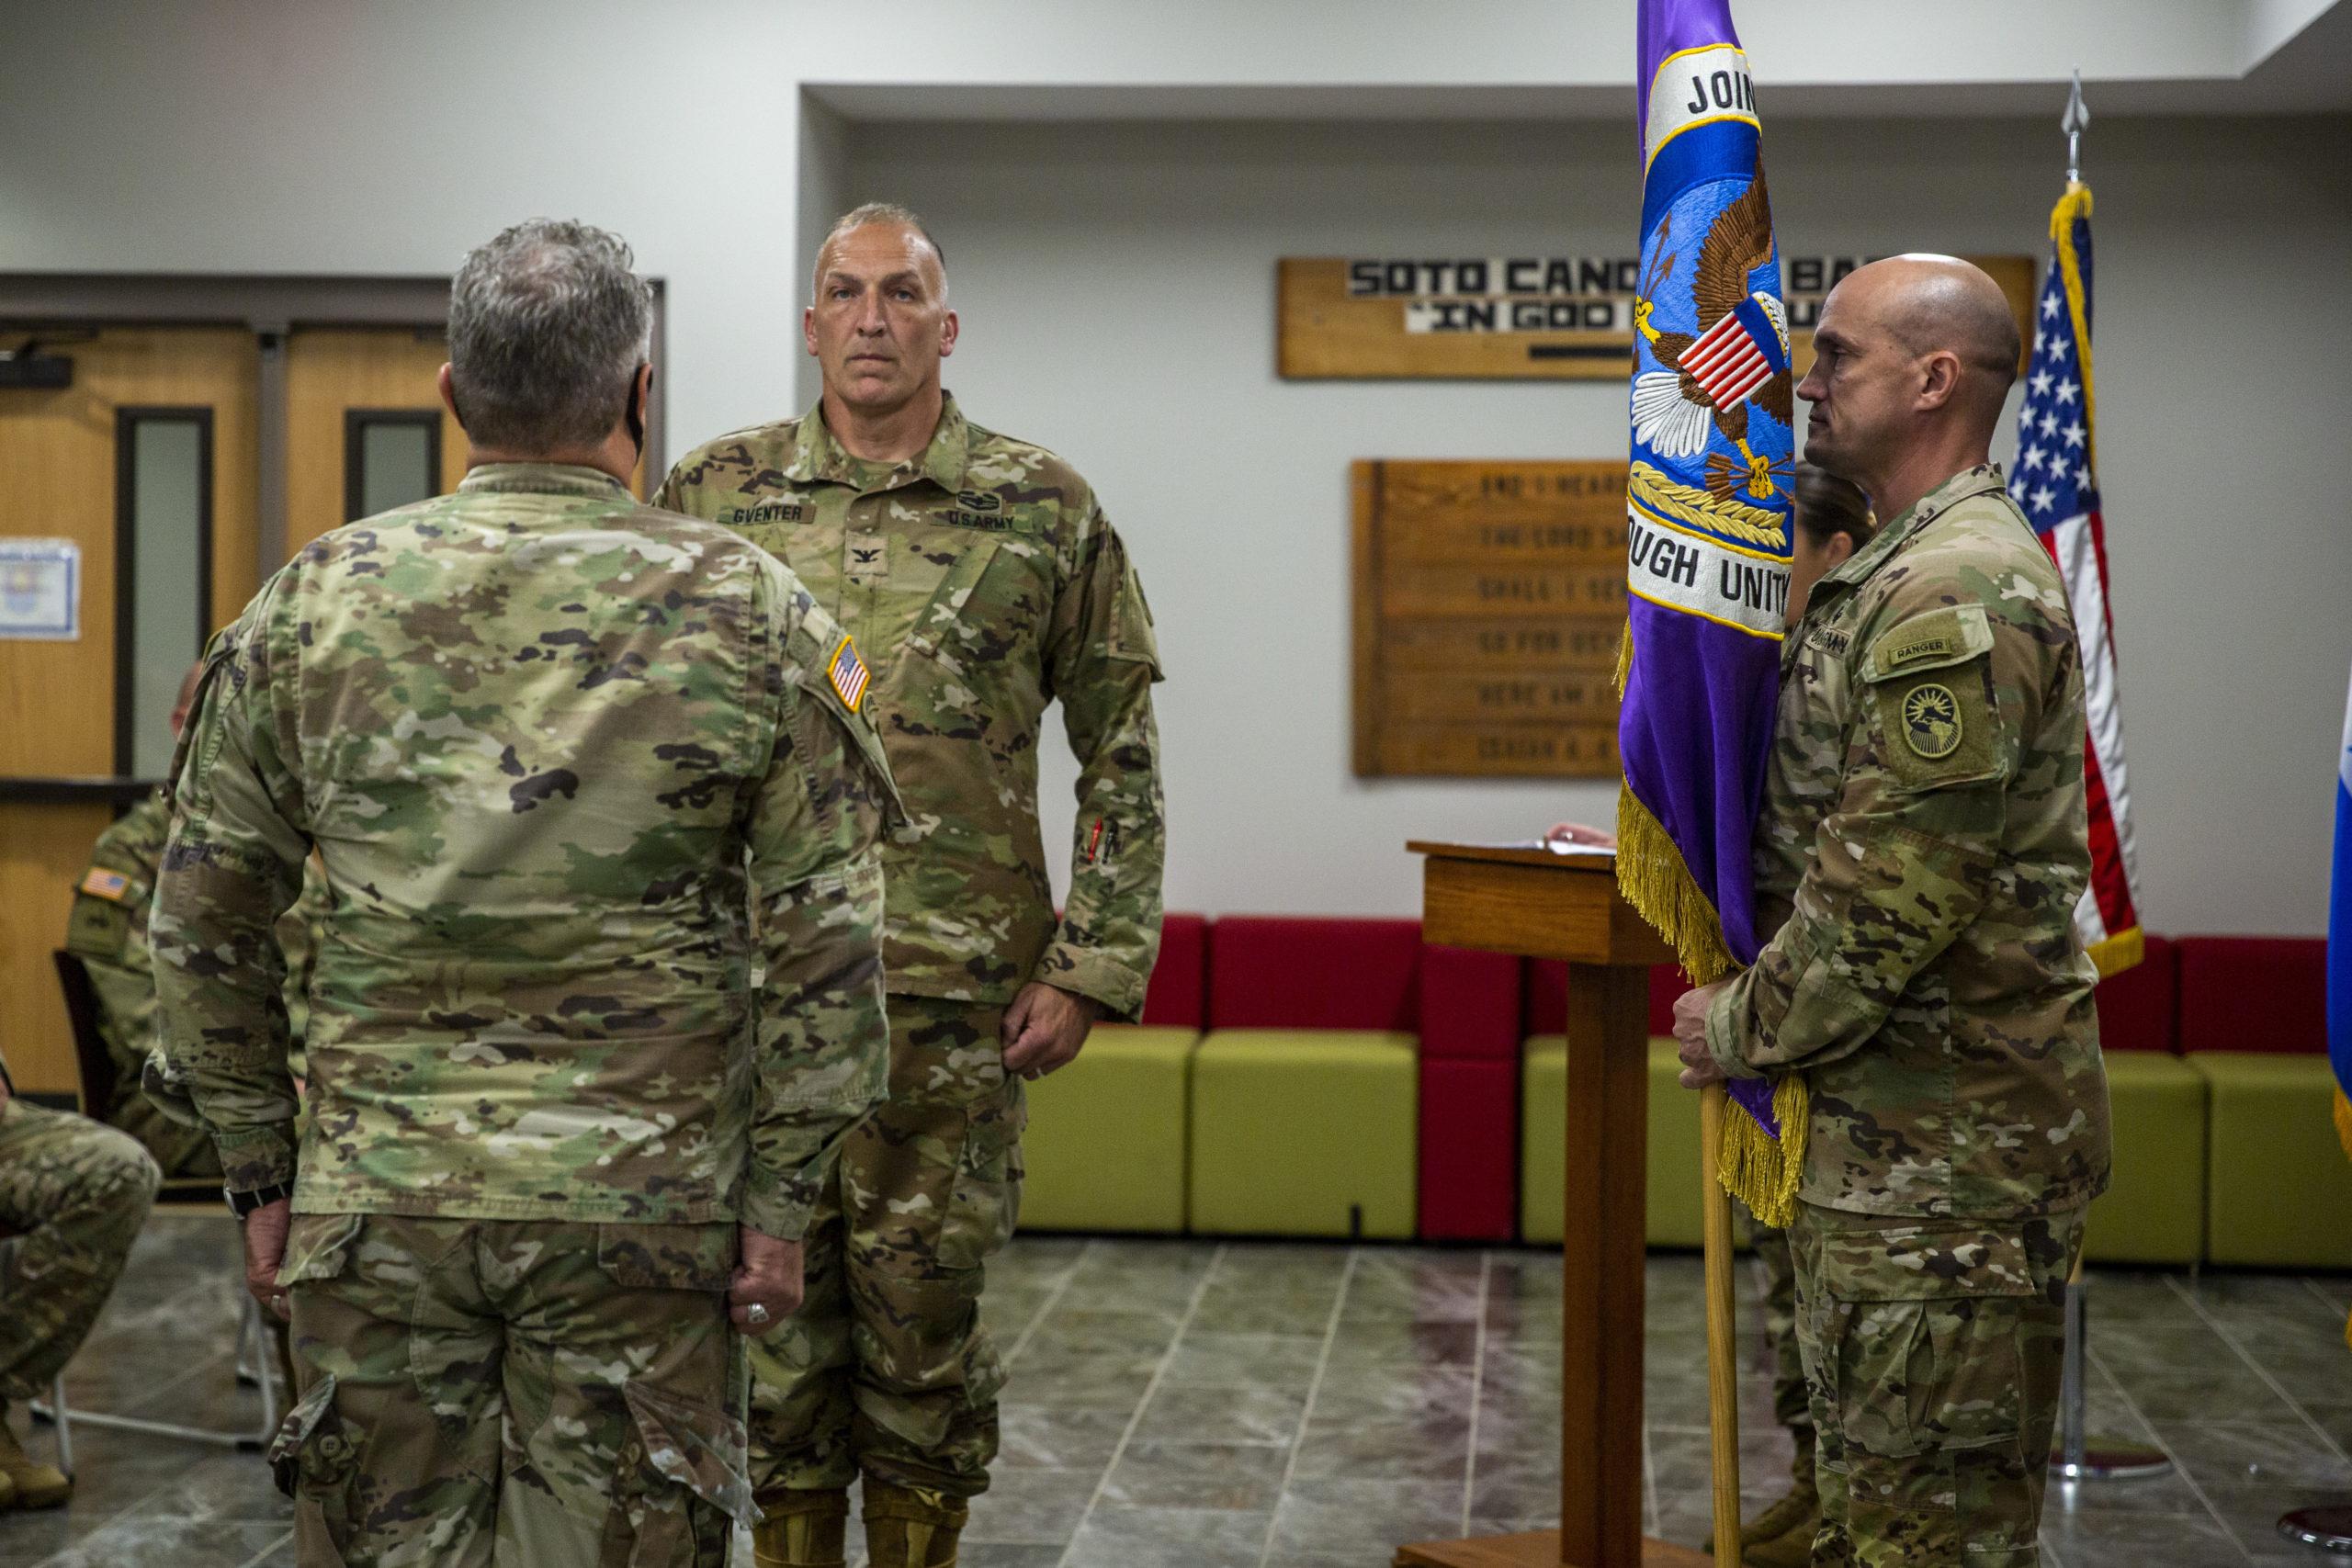 JTF-Bravo New Leadership, Continued Legacy of Partnership